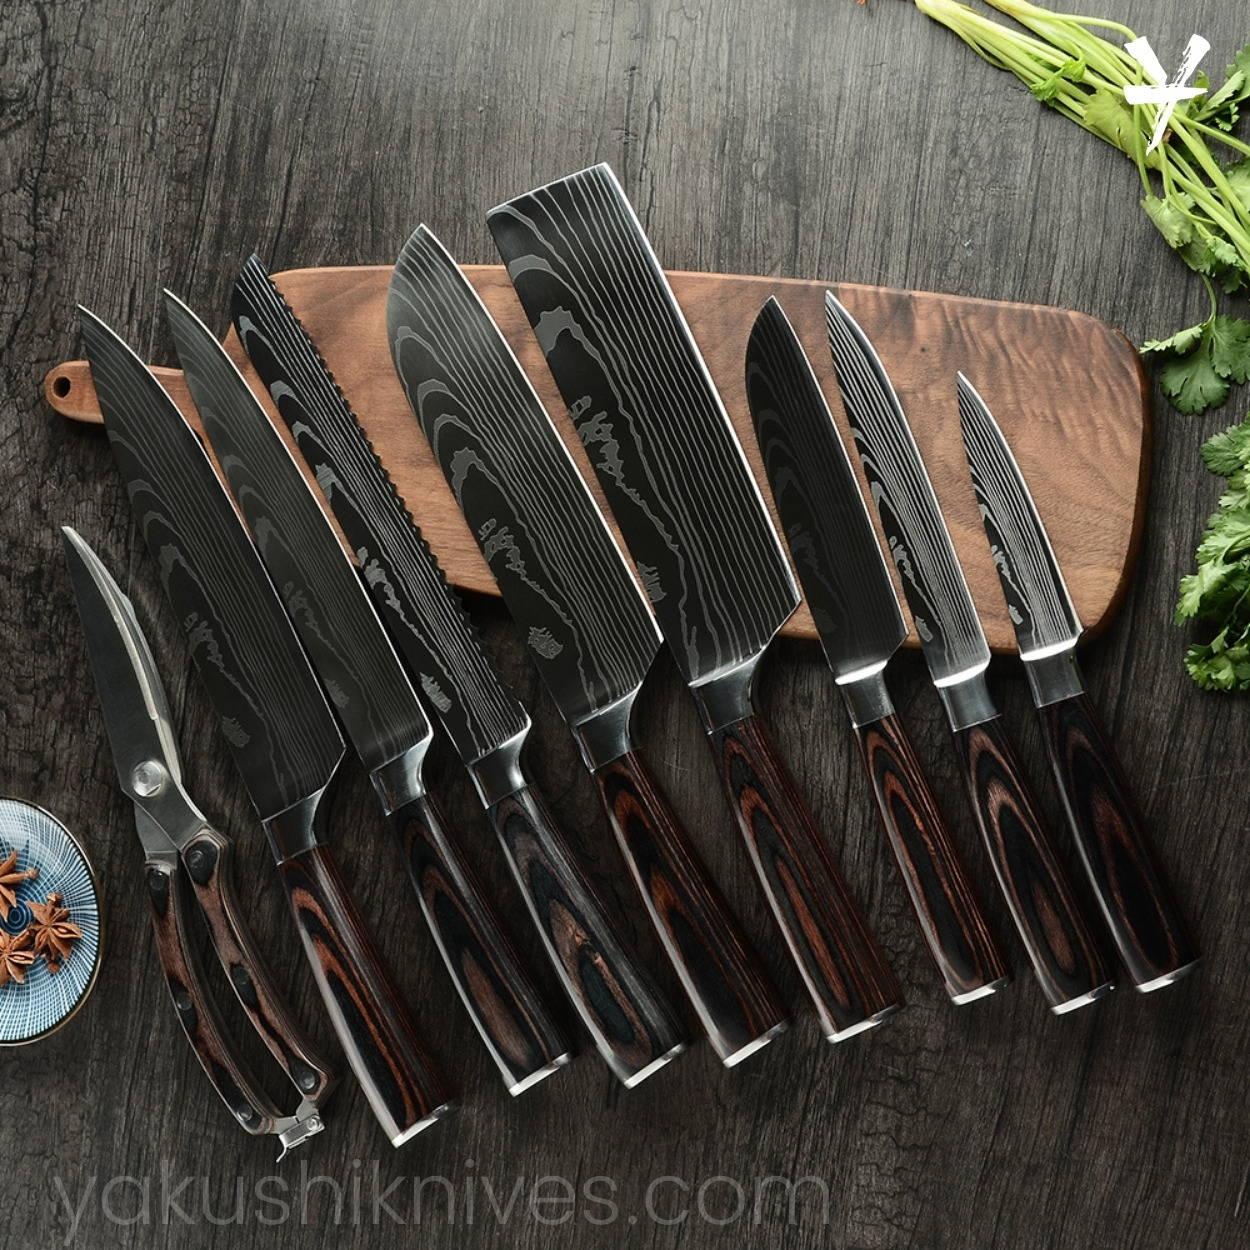 Japanese Knife Set, Chef Knife Set, Damascus Knives, Professional Kitchen Knives